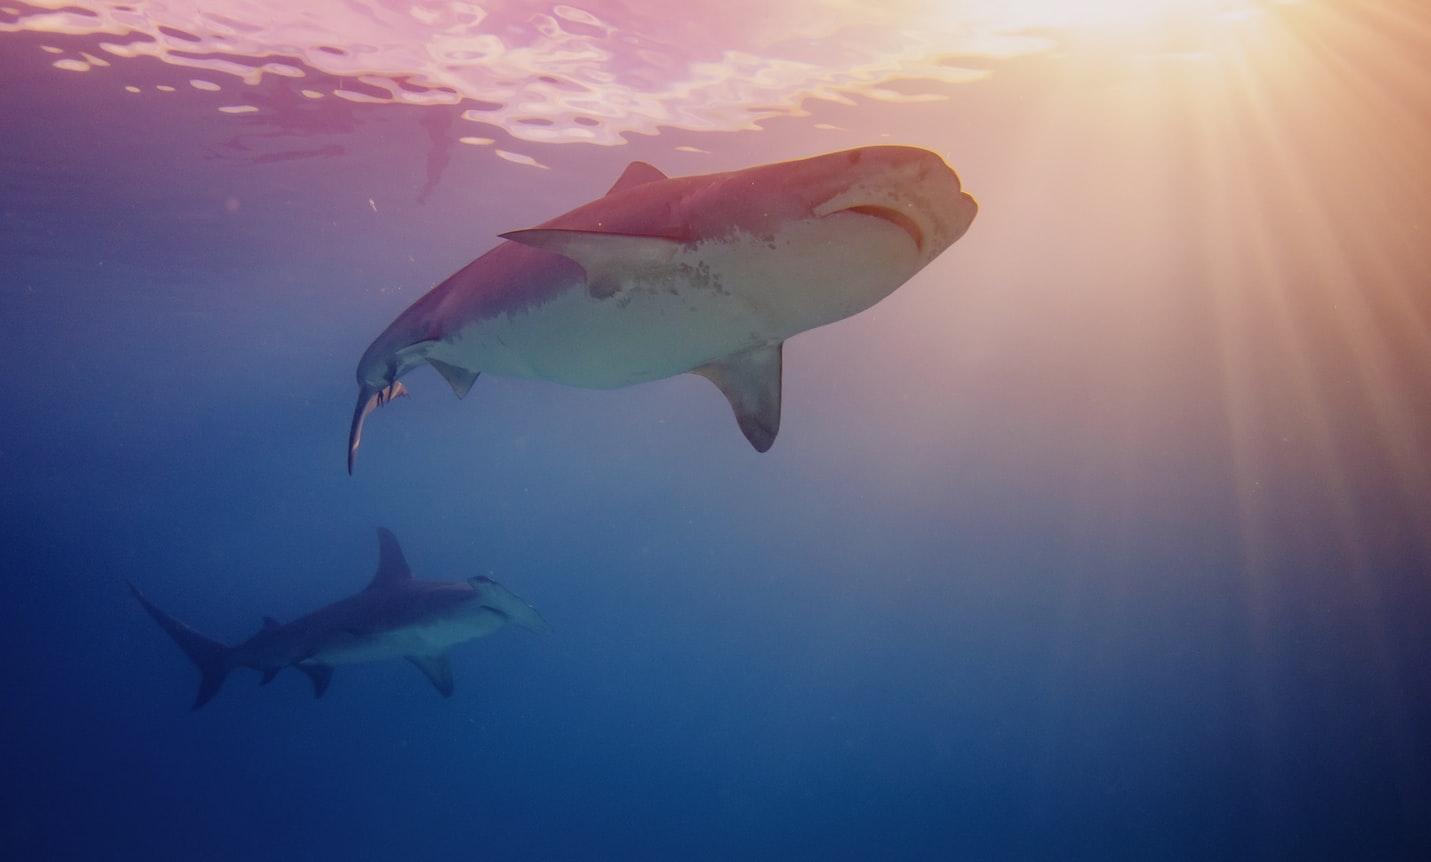 5 mythes sur les attaques de requin :